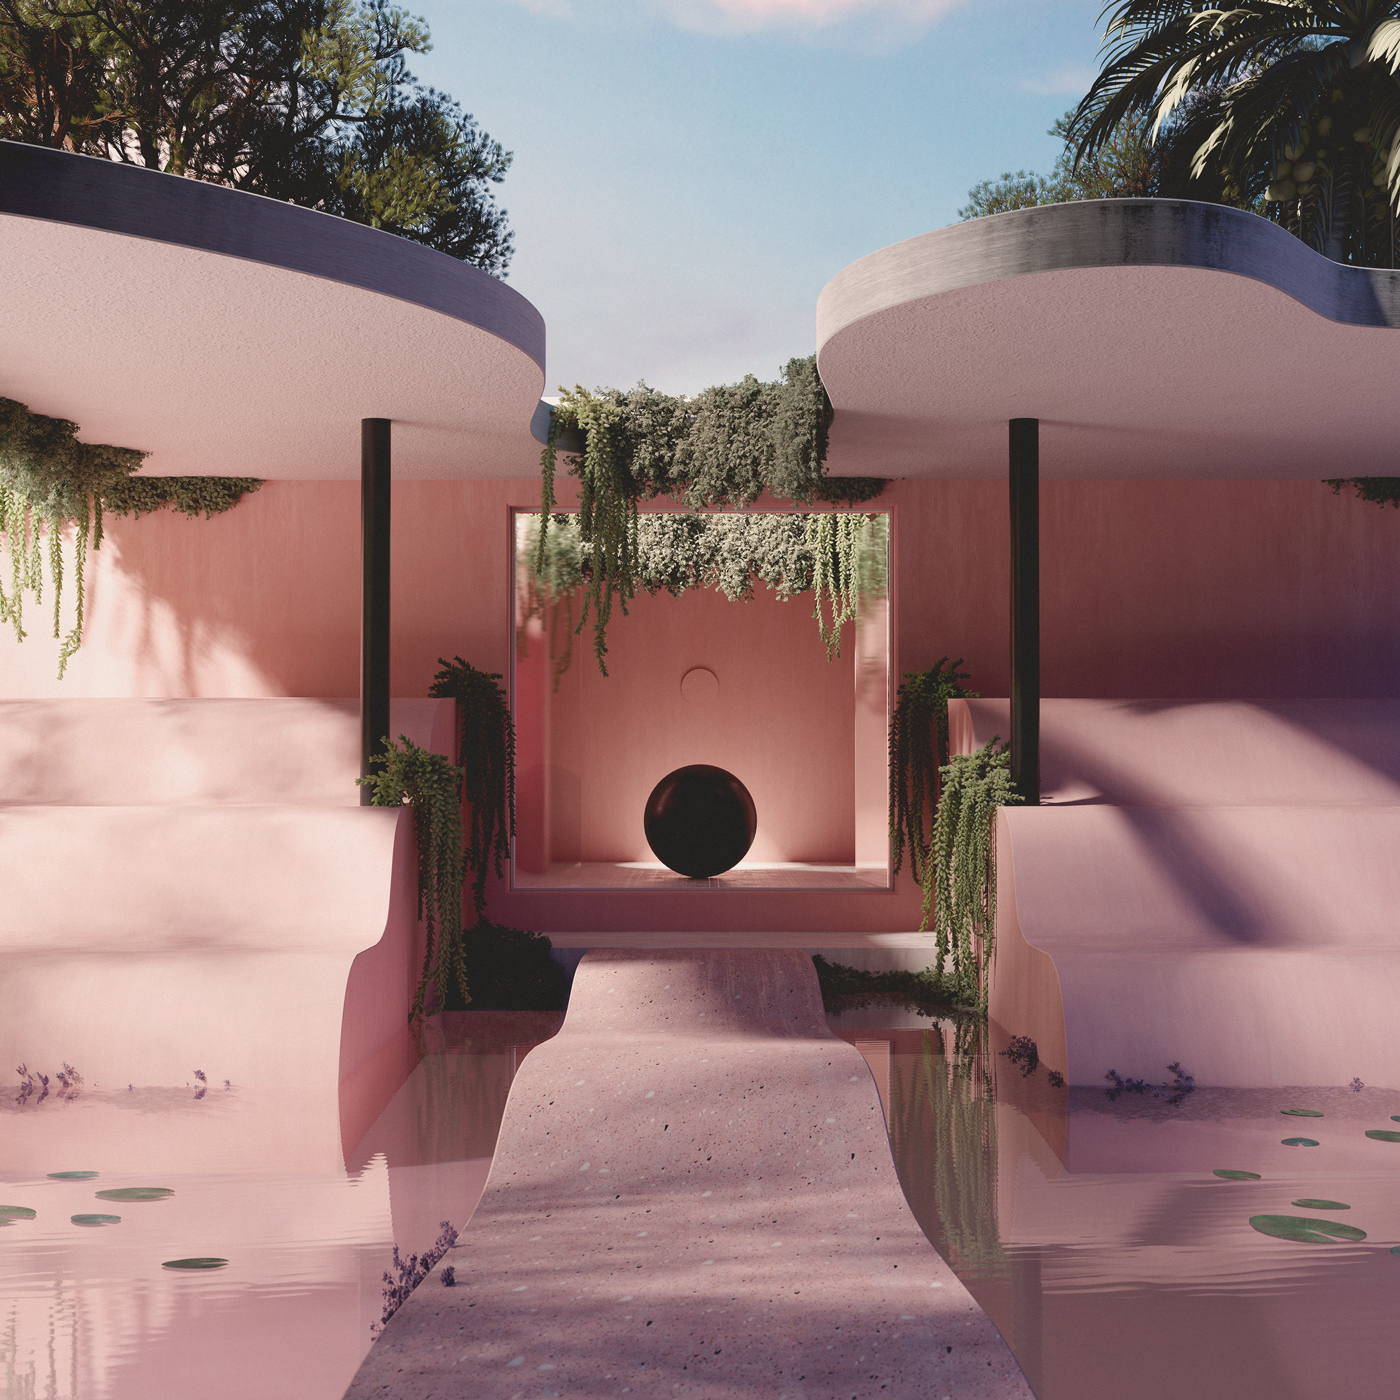 Andrés Reisinger Summer House, Spain —2019